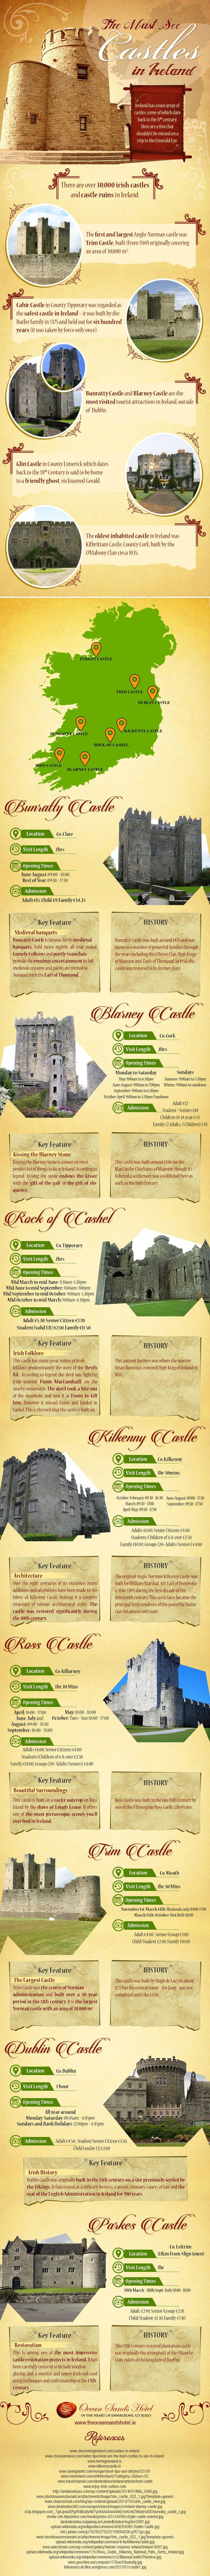 Most popular castles in Ireland                                                                                                                                                     More